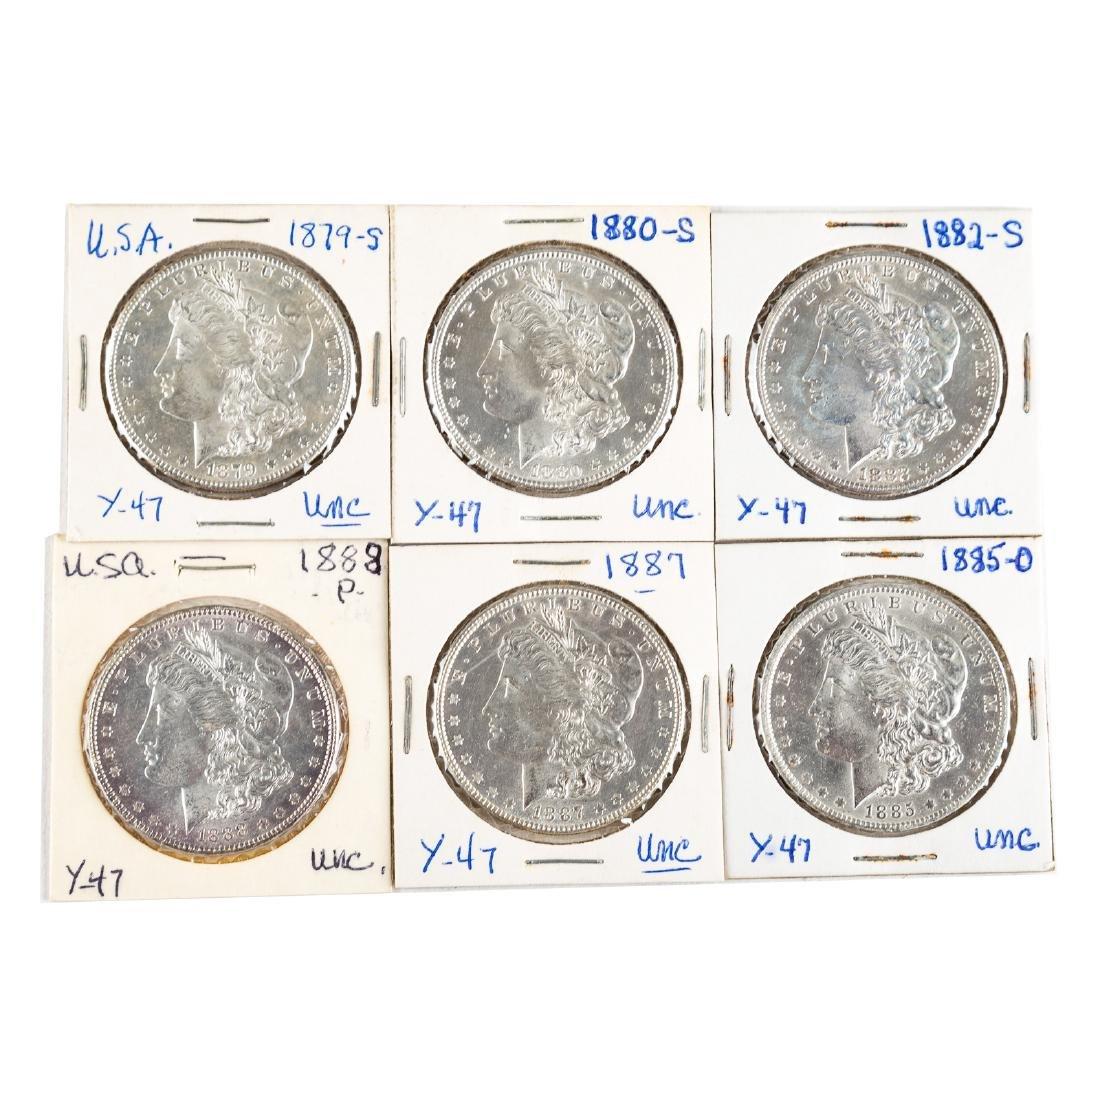 [US] Six Uncirculated Morgan Dollars